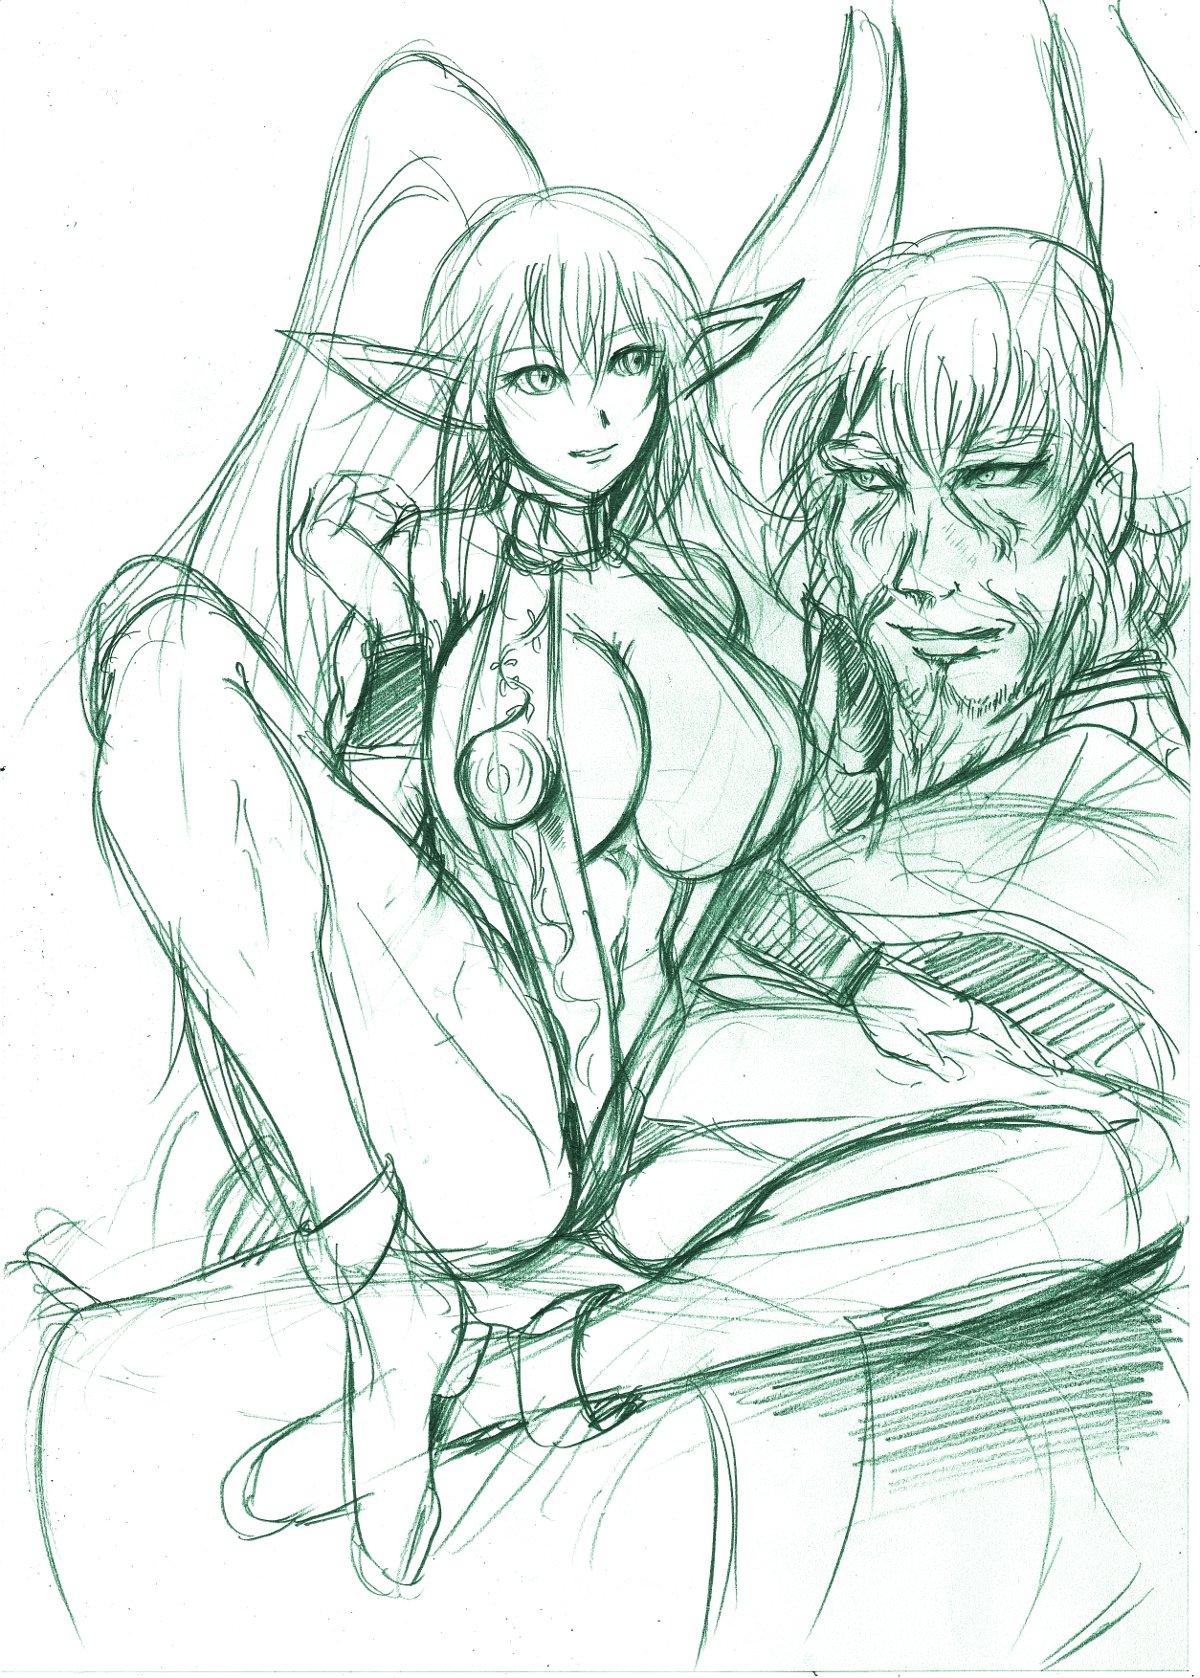 Lungorthin and Mesubutako